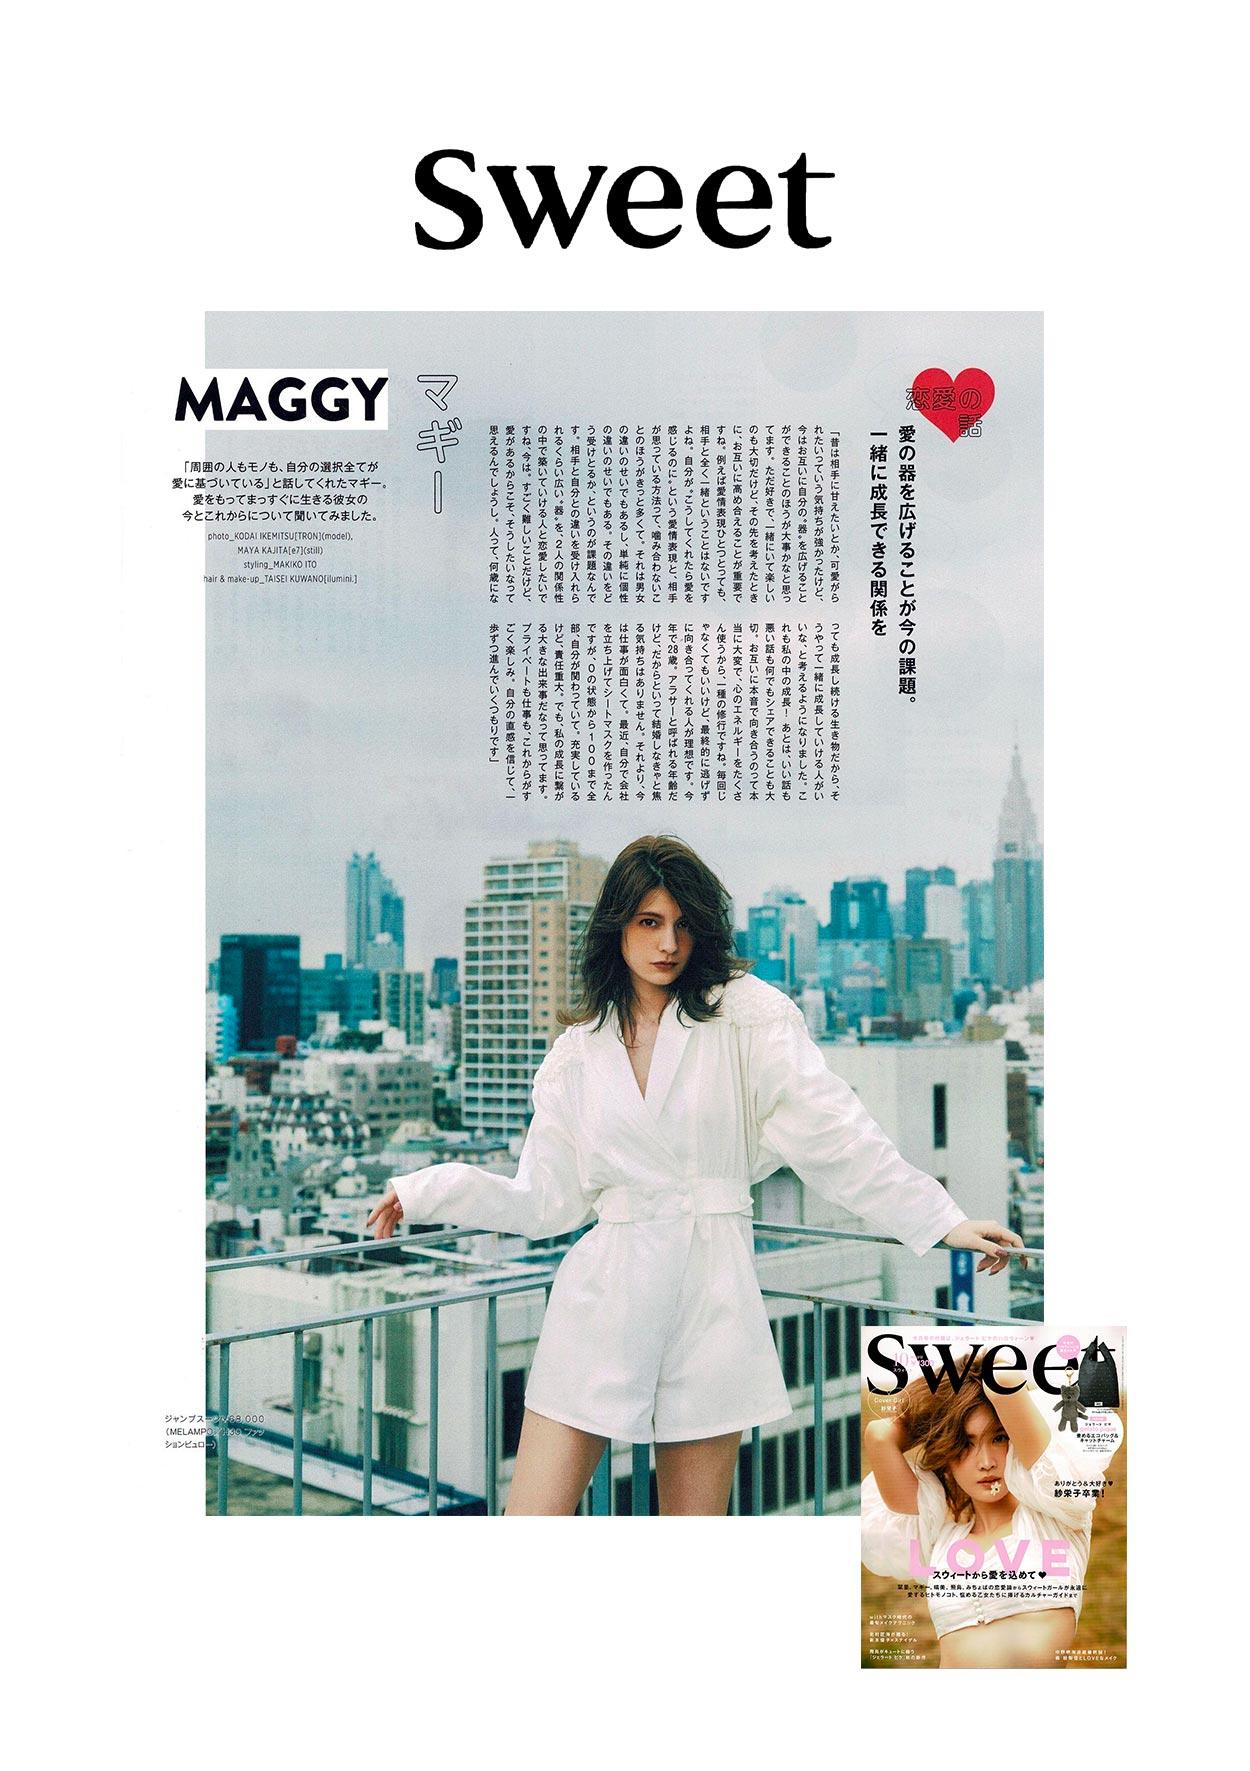 melampo press on sweet Japan magazine - photo 1